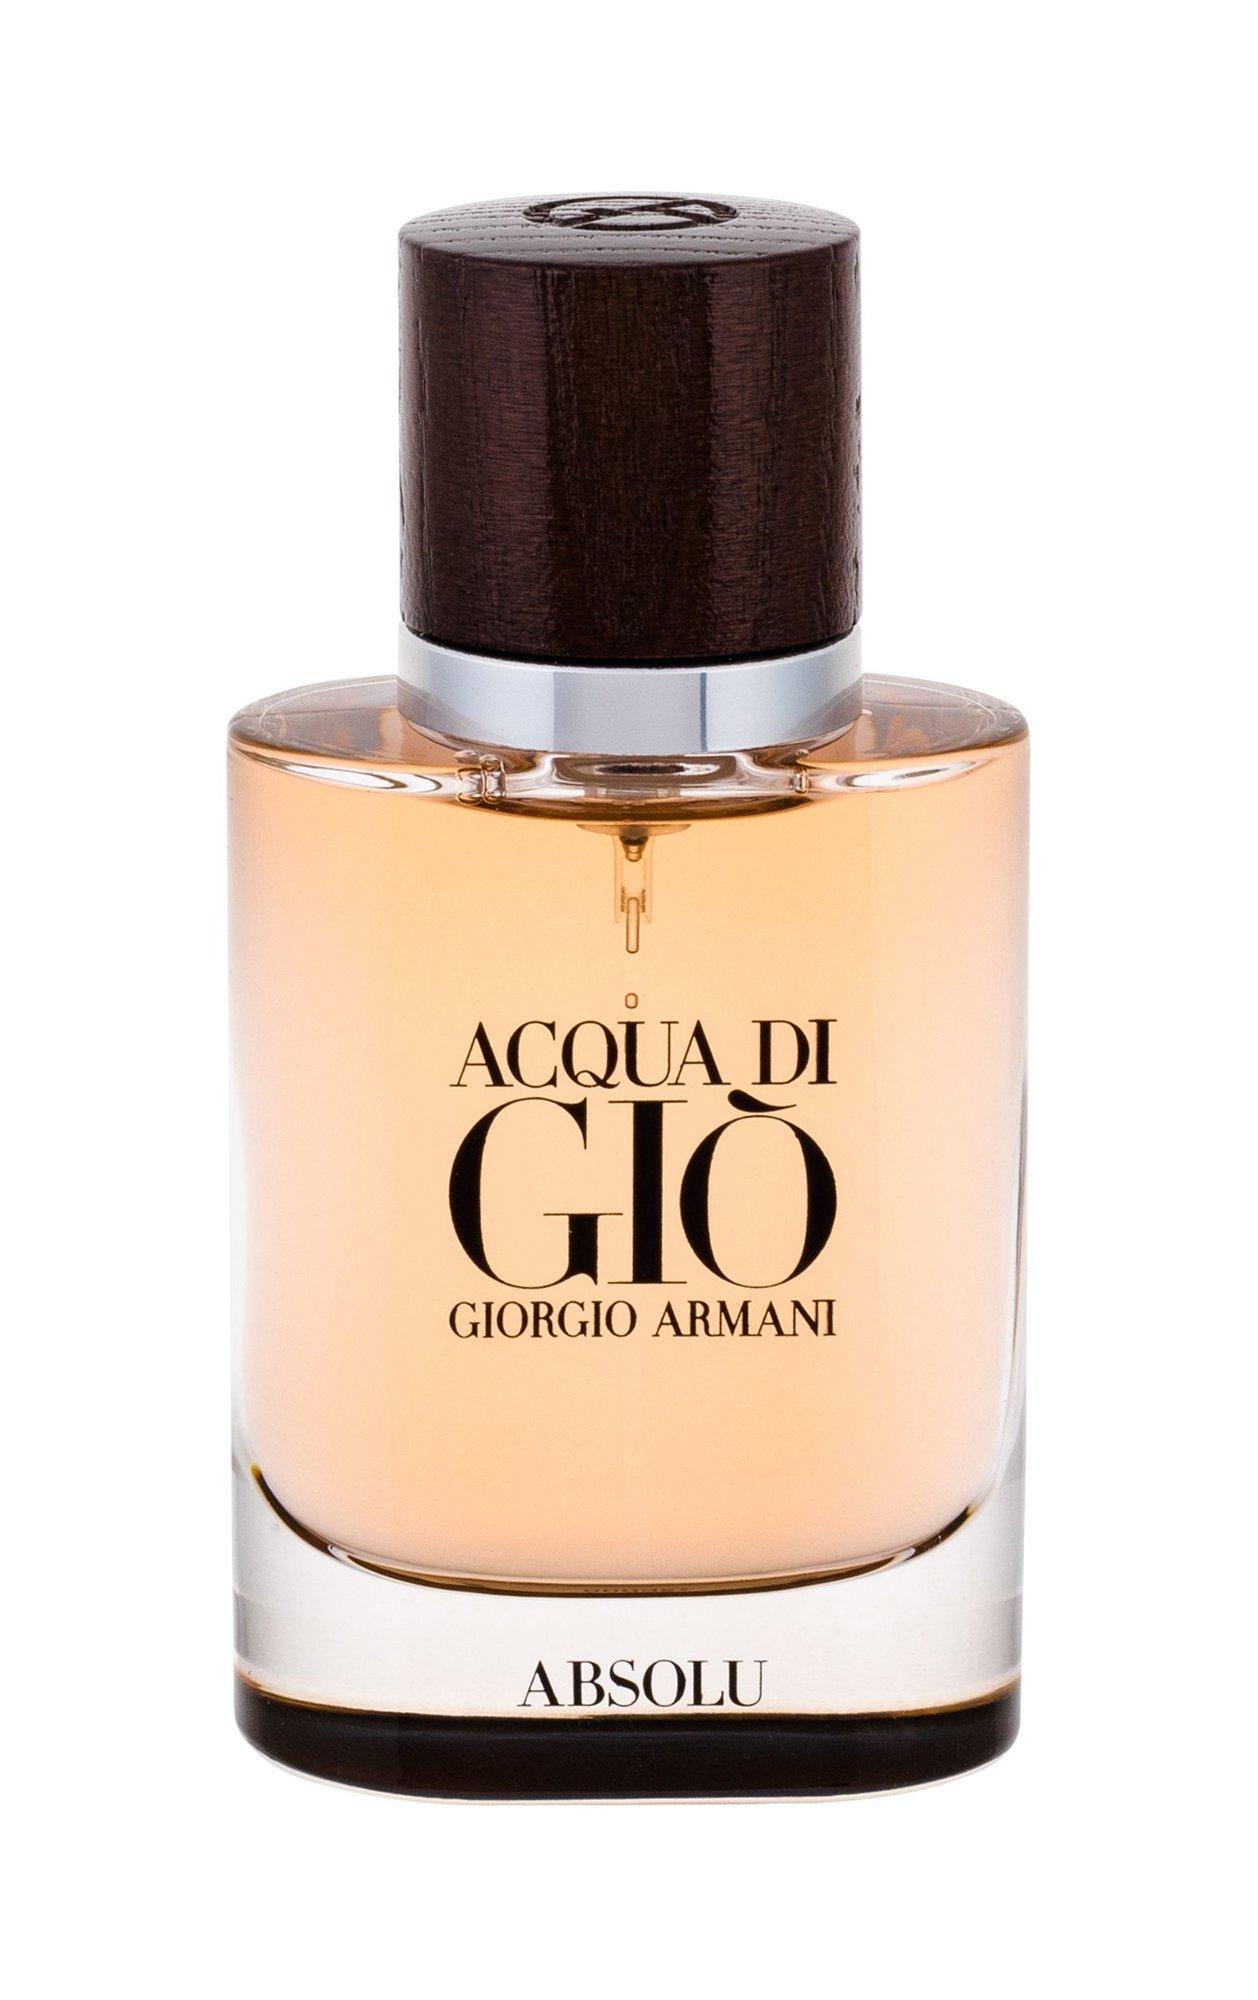 Giorgio Armani Acqua di Gio Absolu EDP 40ml